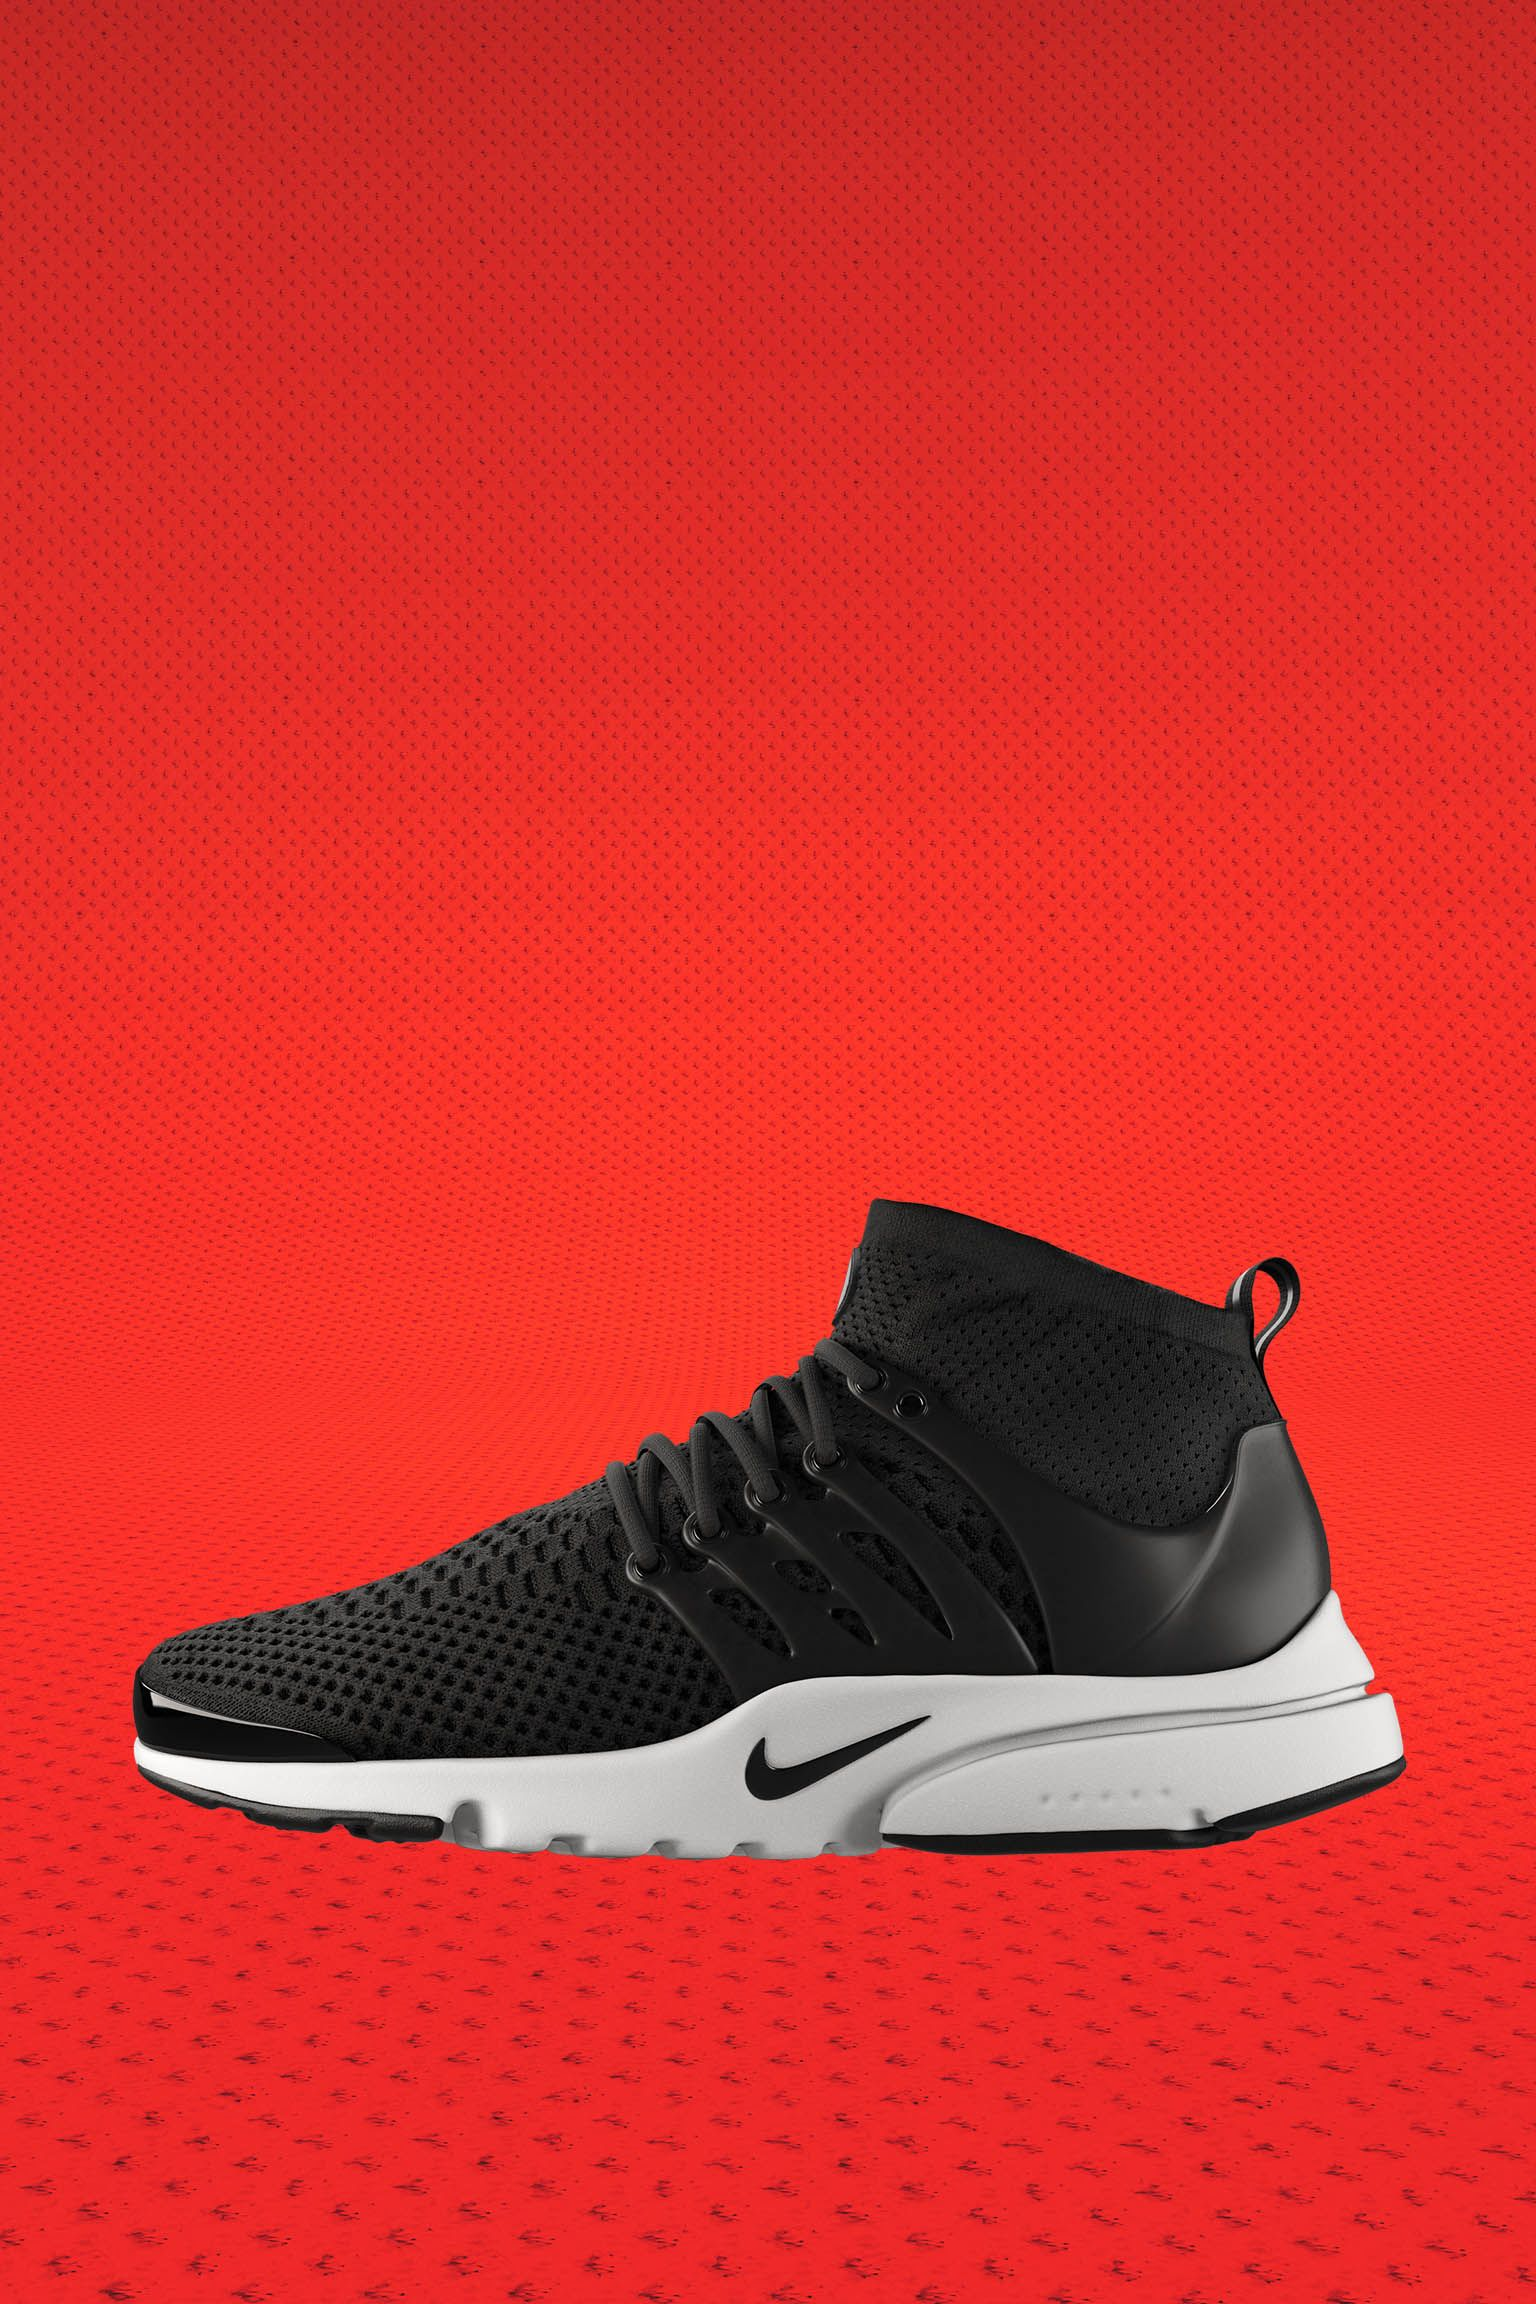 Nike Air Presto Ultra Flyknit 'Black & White' Release Date